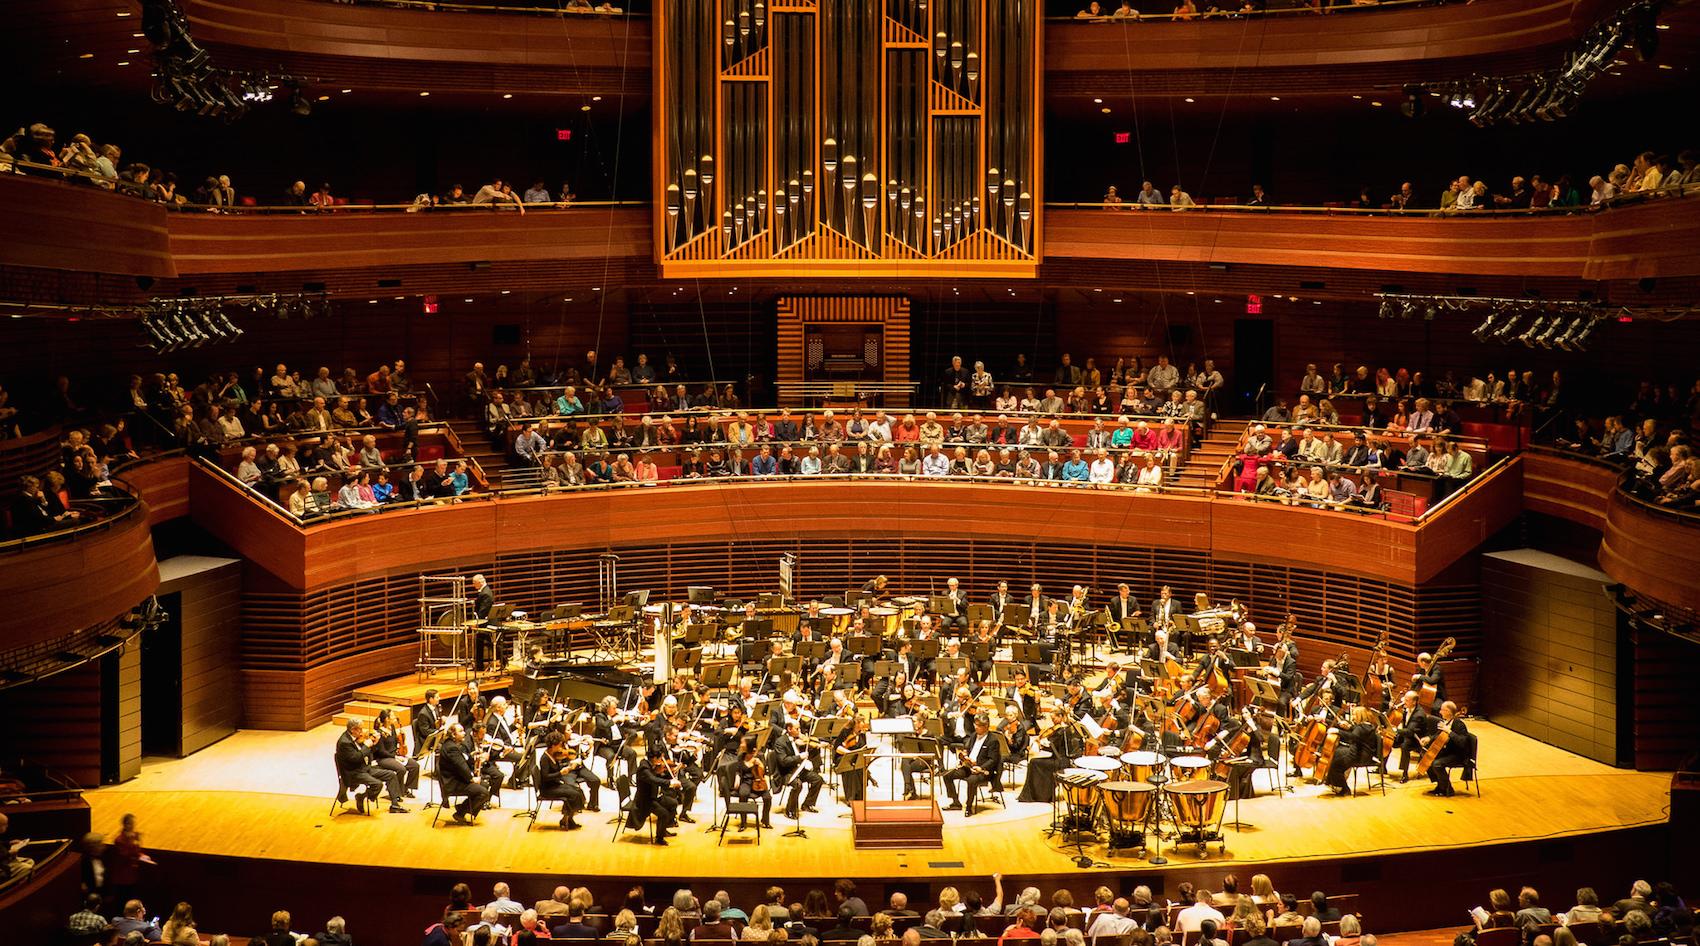 Philadelphia Orchestra (flickr/lumiereimages)